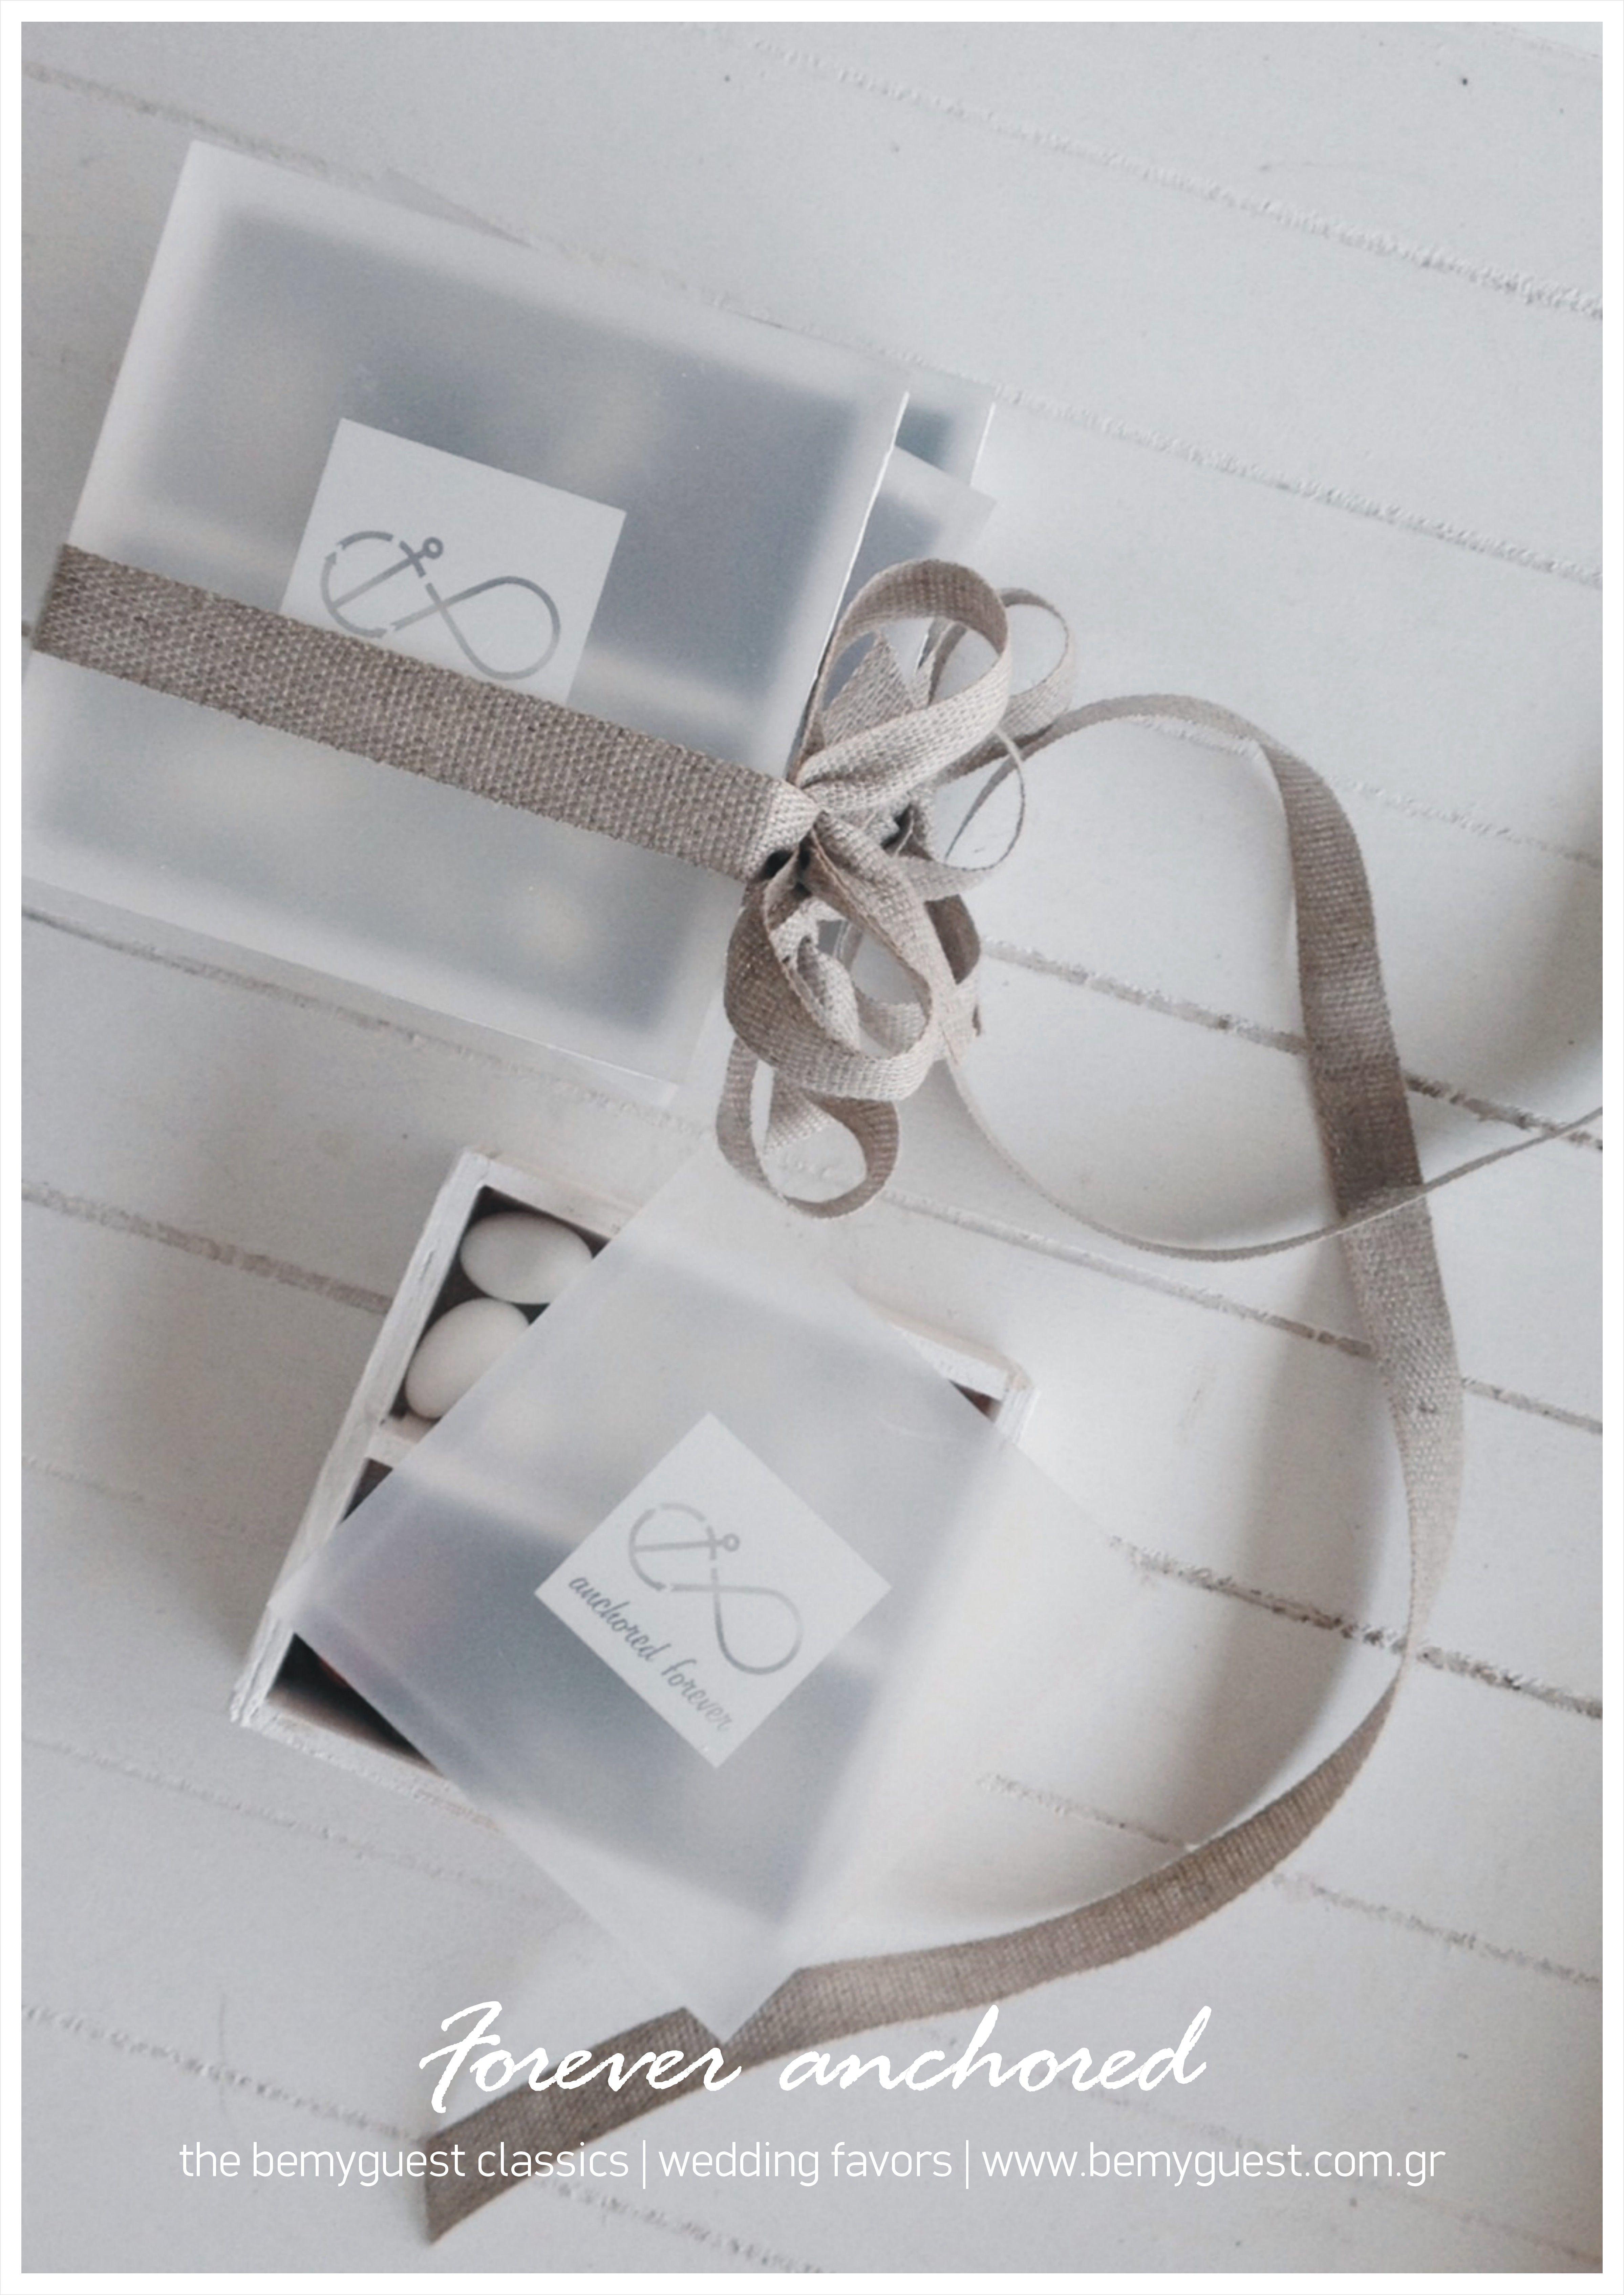 wedding giveaway gifts | greek island | custom made events | wooden ...